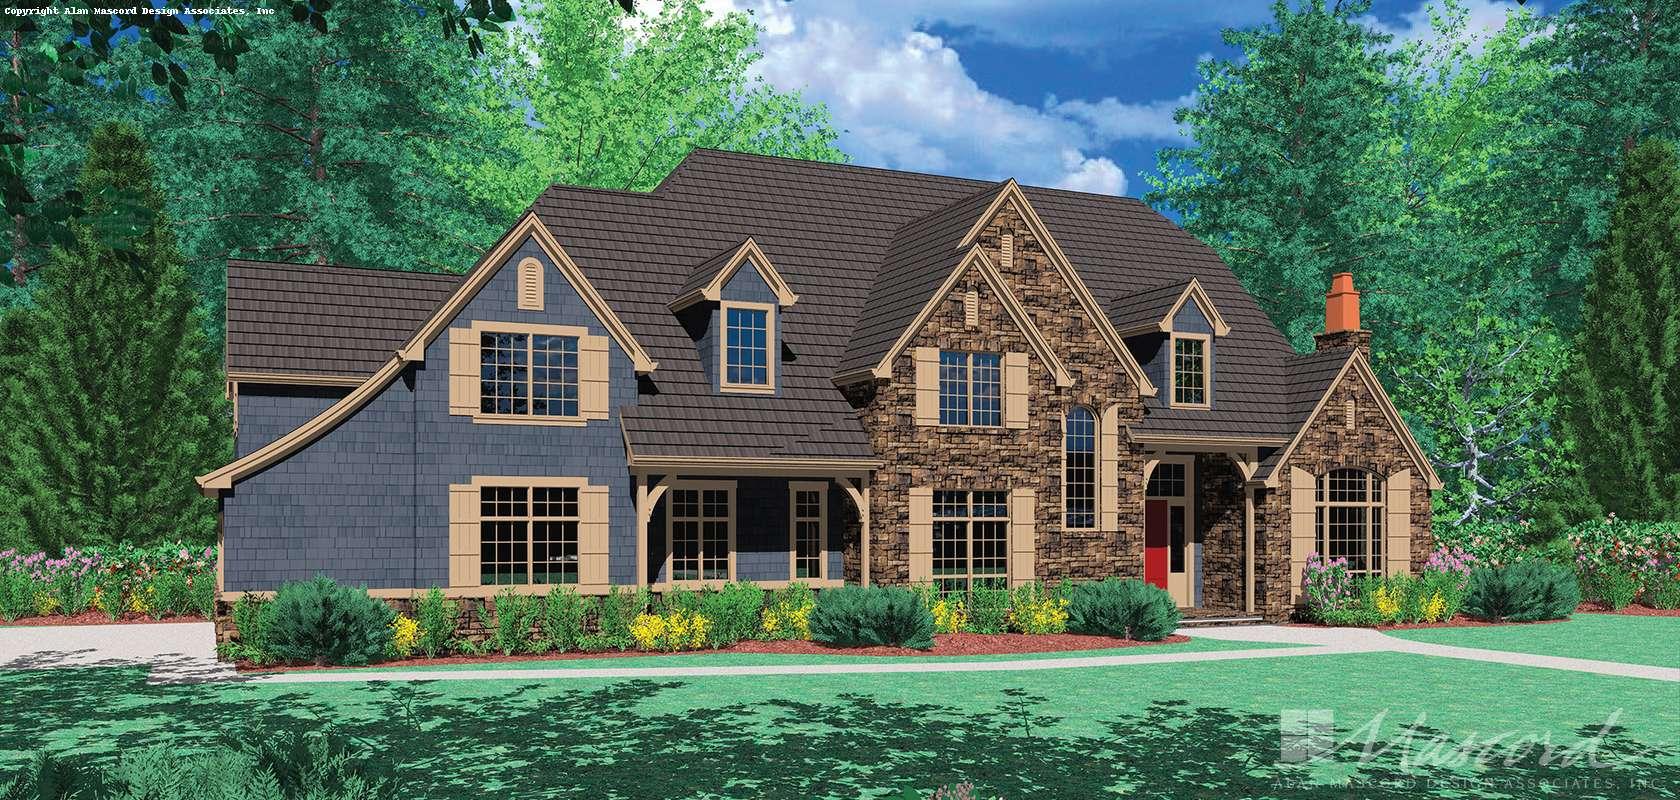 Mascord House Plan 2422: The Fireglow